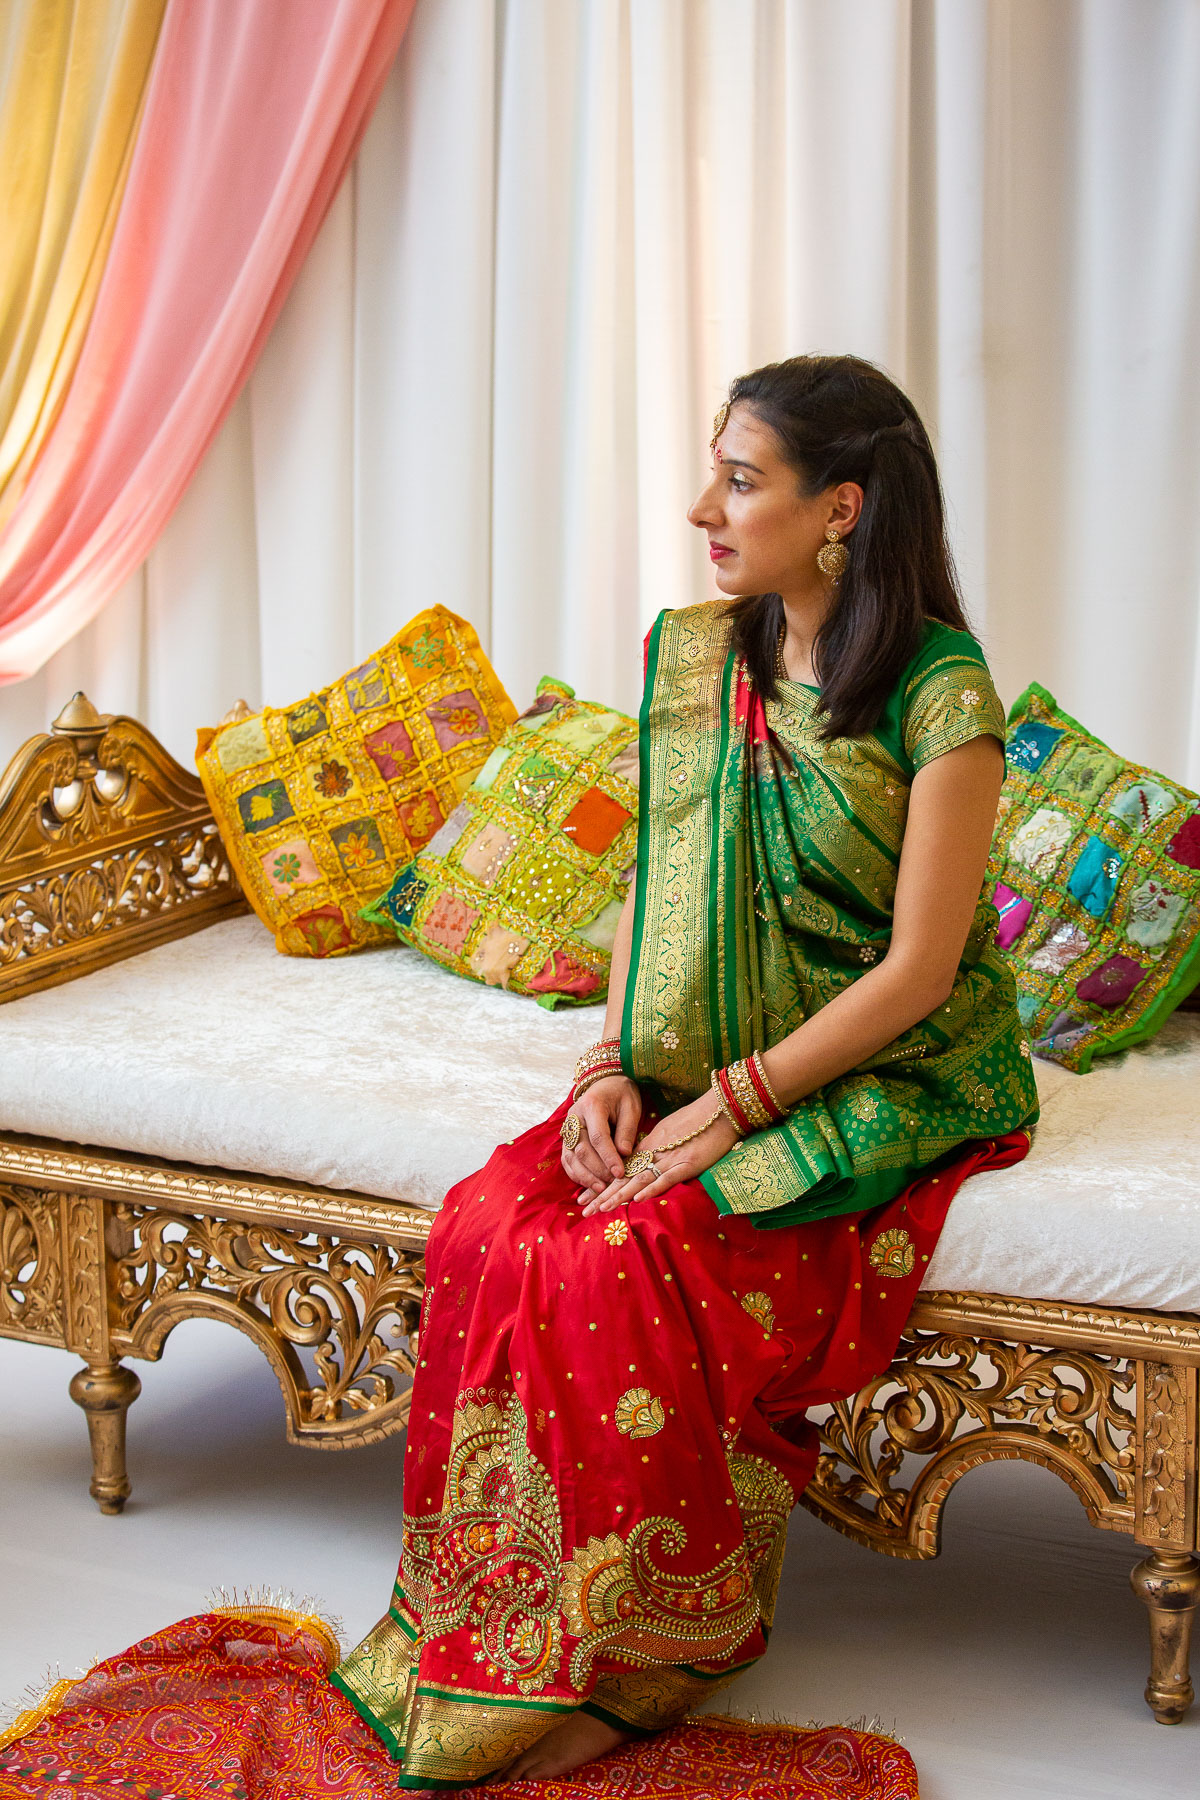 Asian-wedding-photographer-Bristol-hindu-baby-shower-godh-bharai-natalia-smith-photography-0017.jpg